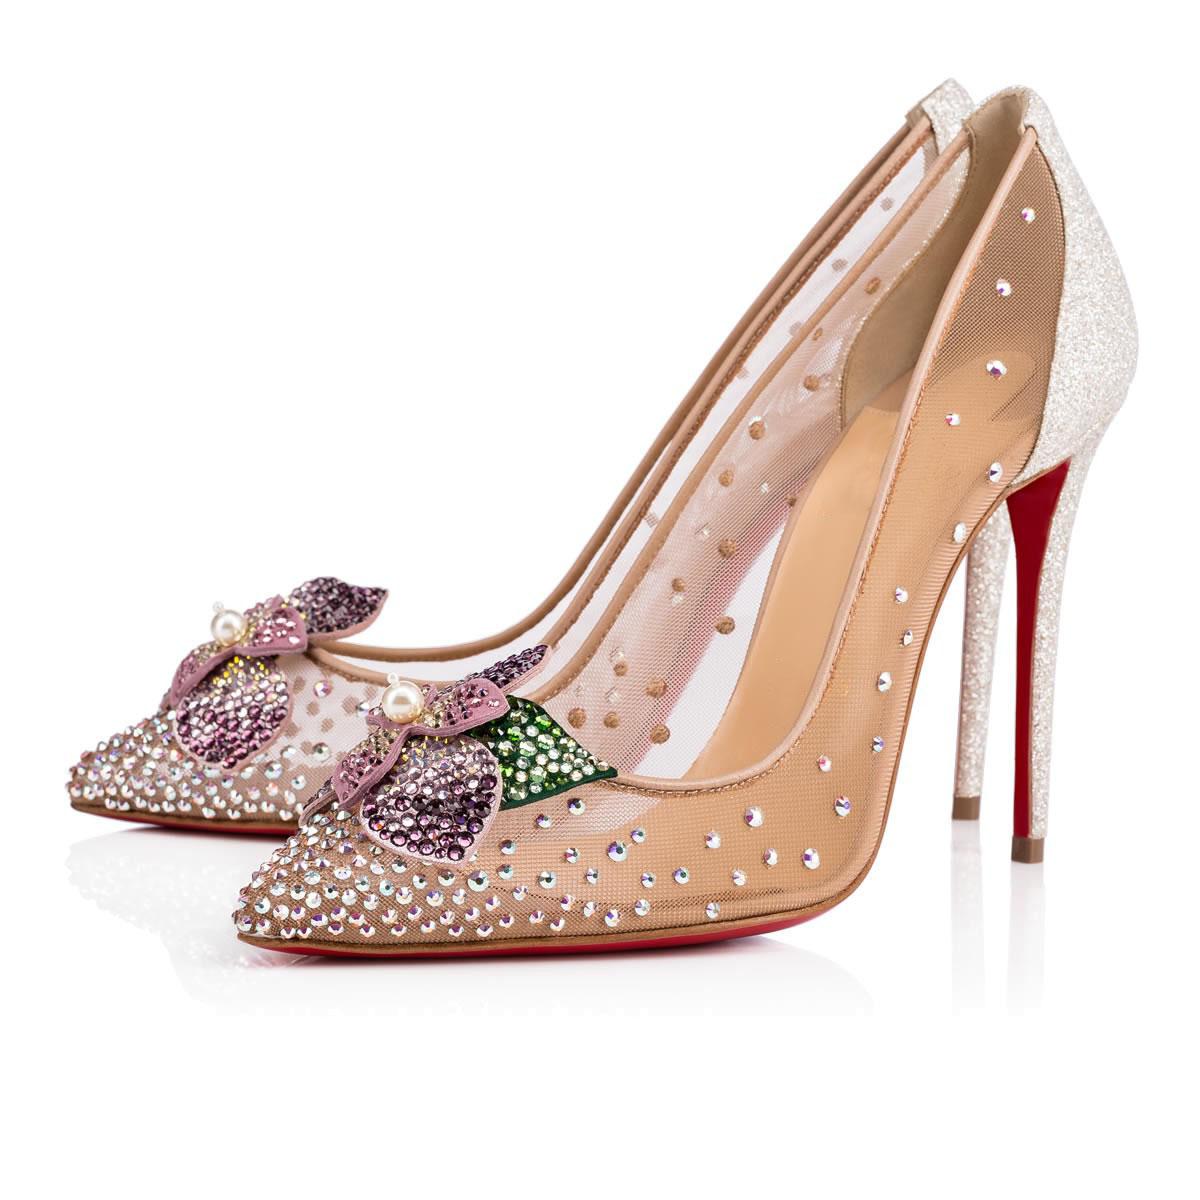 2f281490e21 US  58 - 2018 spring summer high heels 12cm stilettos clear mesh flowers wedding  shoes big size mesh pumps - www.ardenfurtado.com